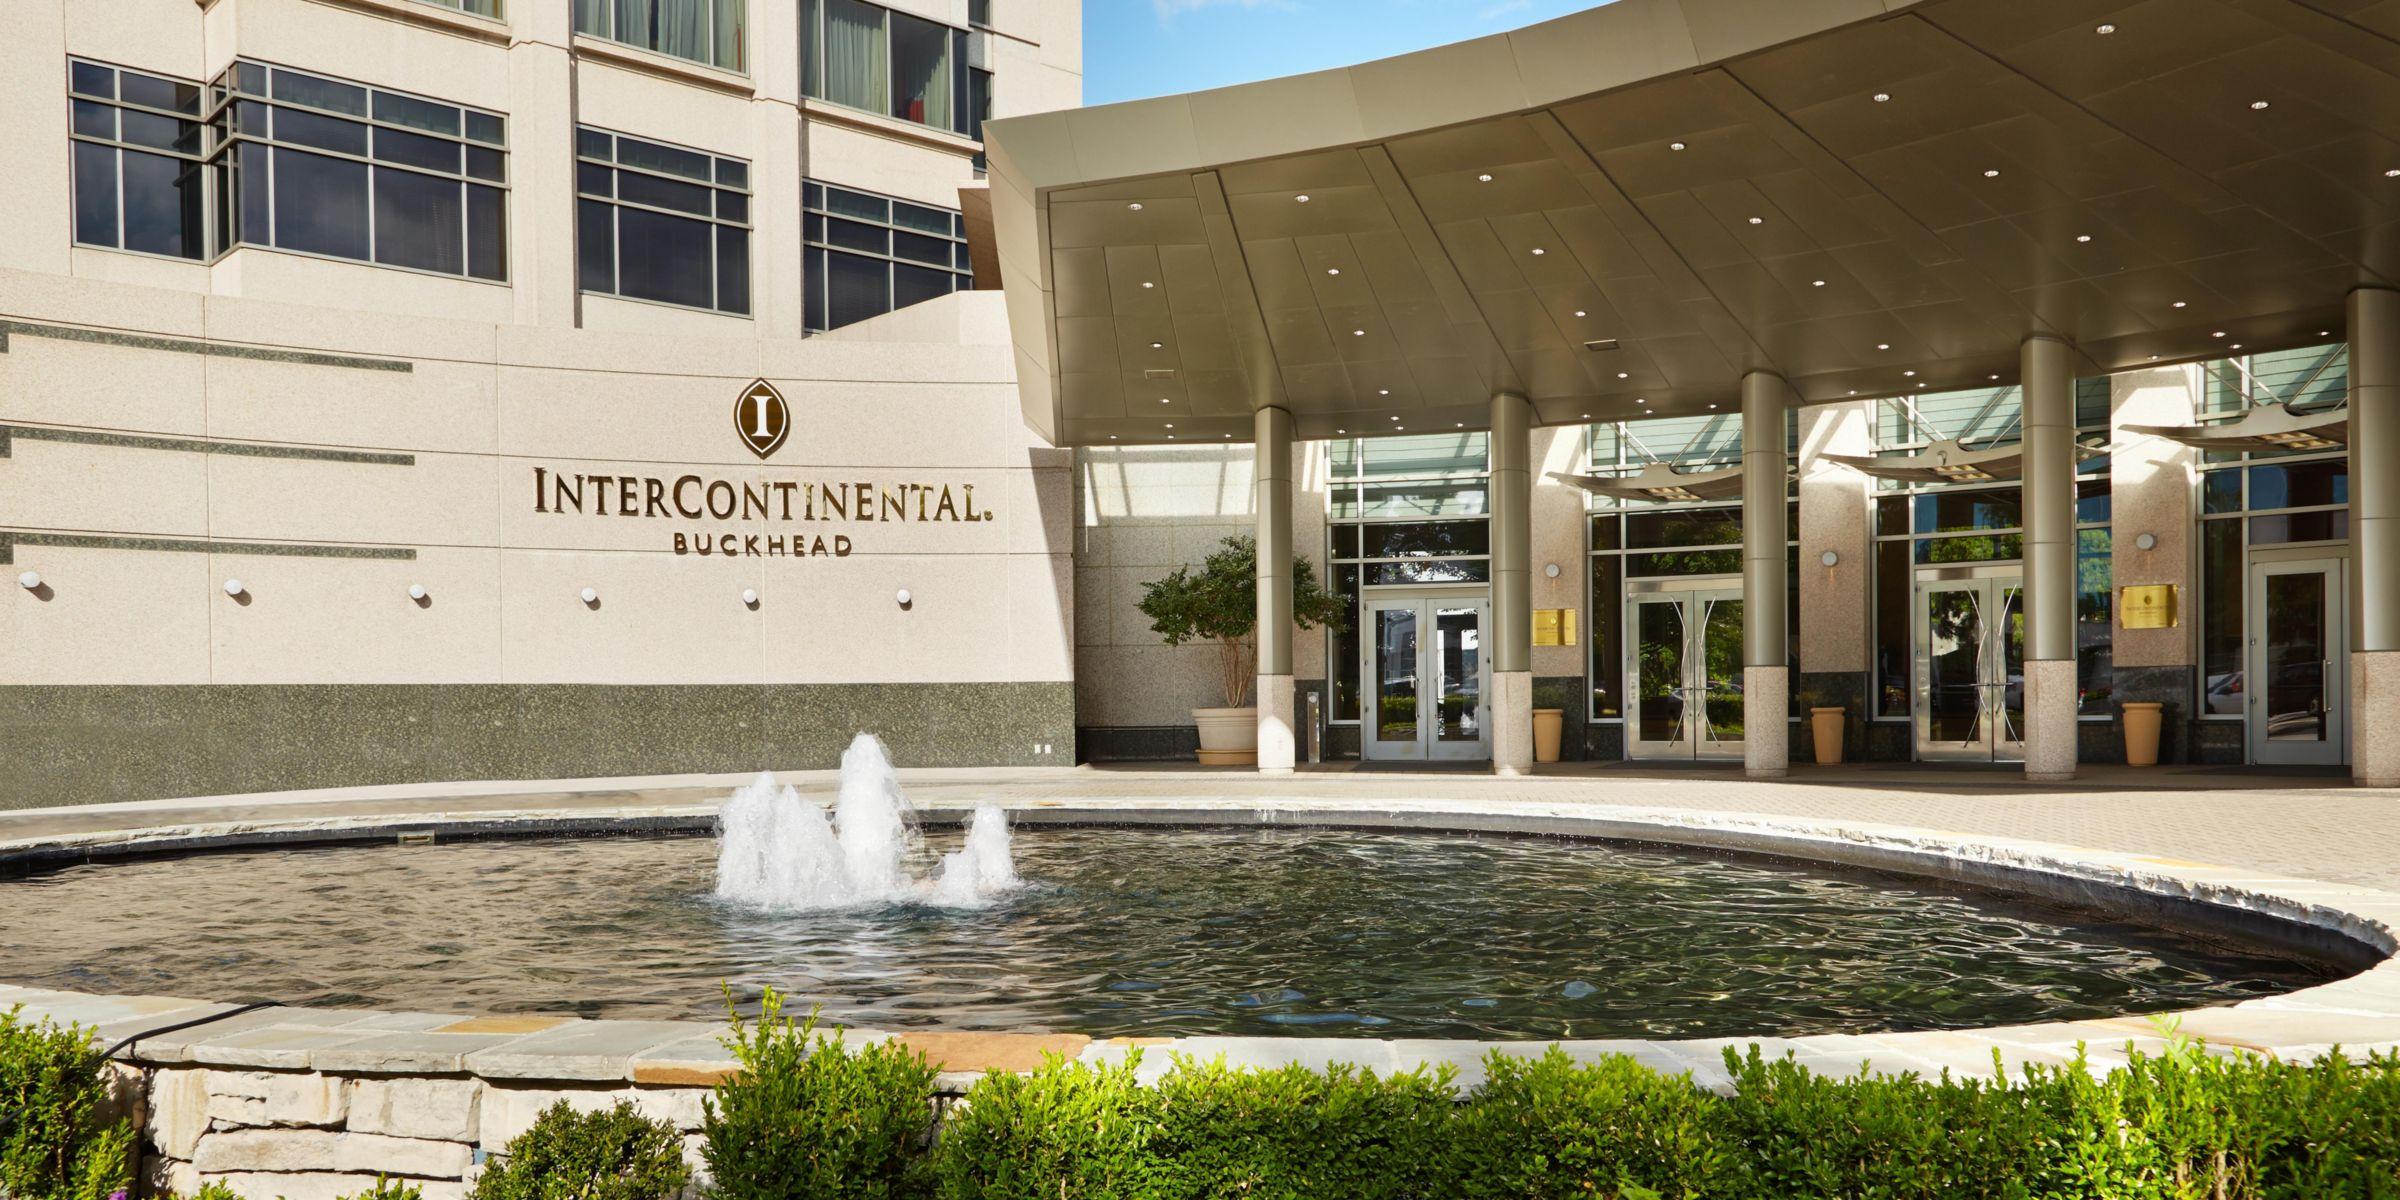 Buckhead Atlanta Hotel Intercontinental Ga Luxury